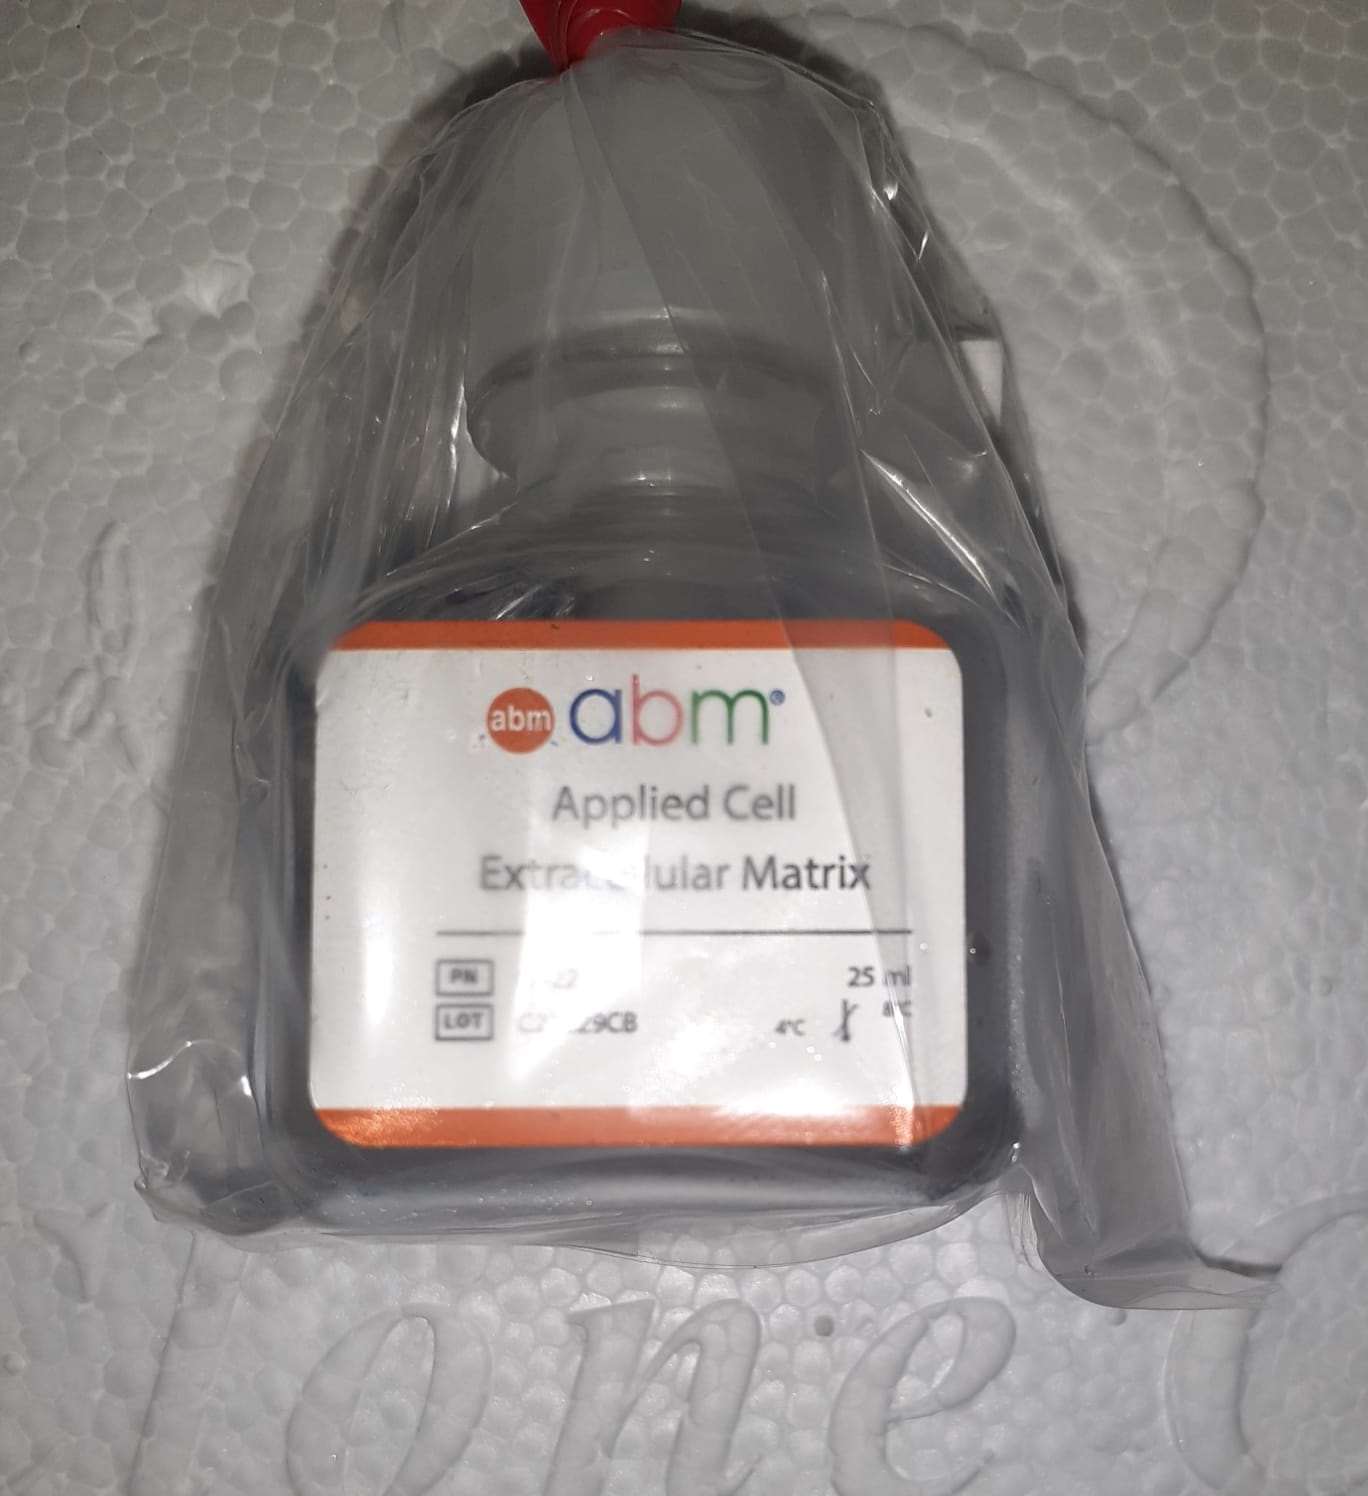 abm applied cells